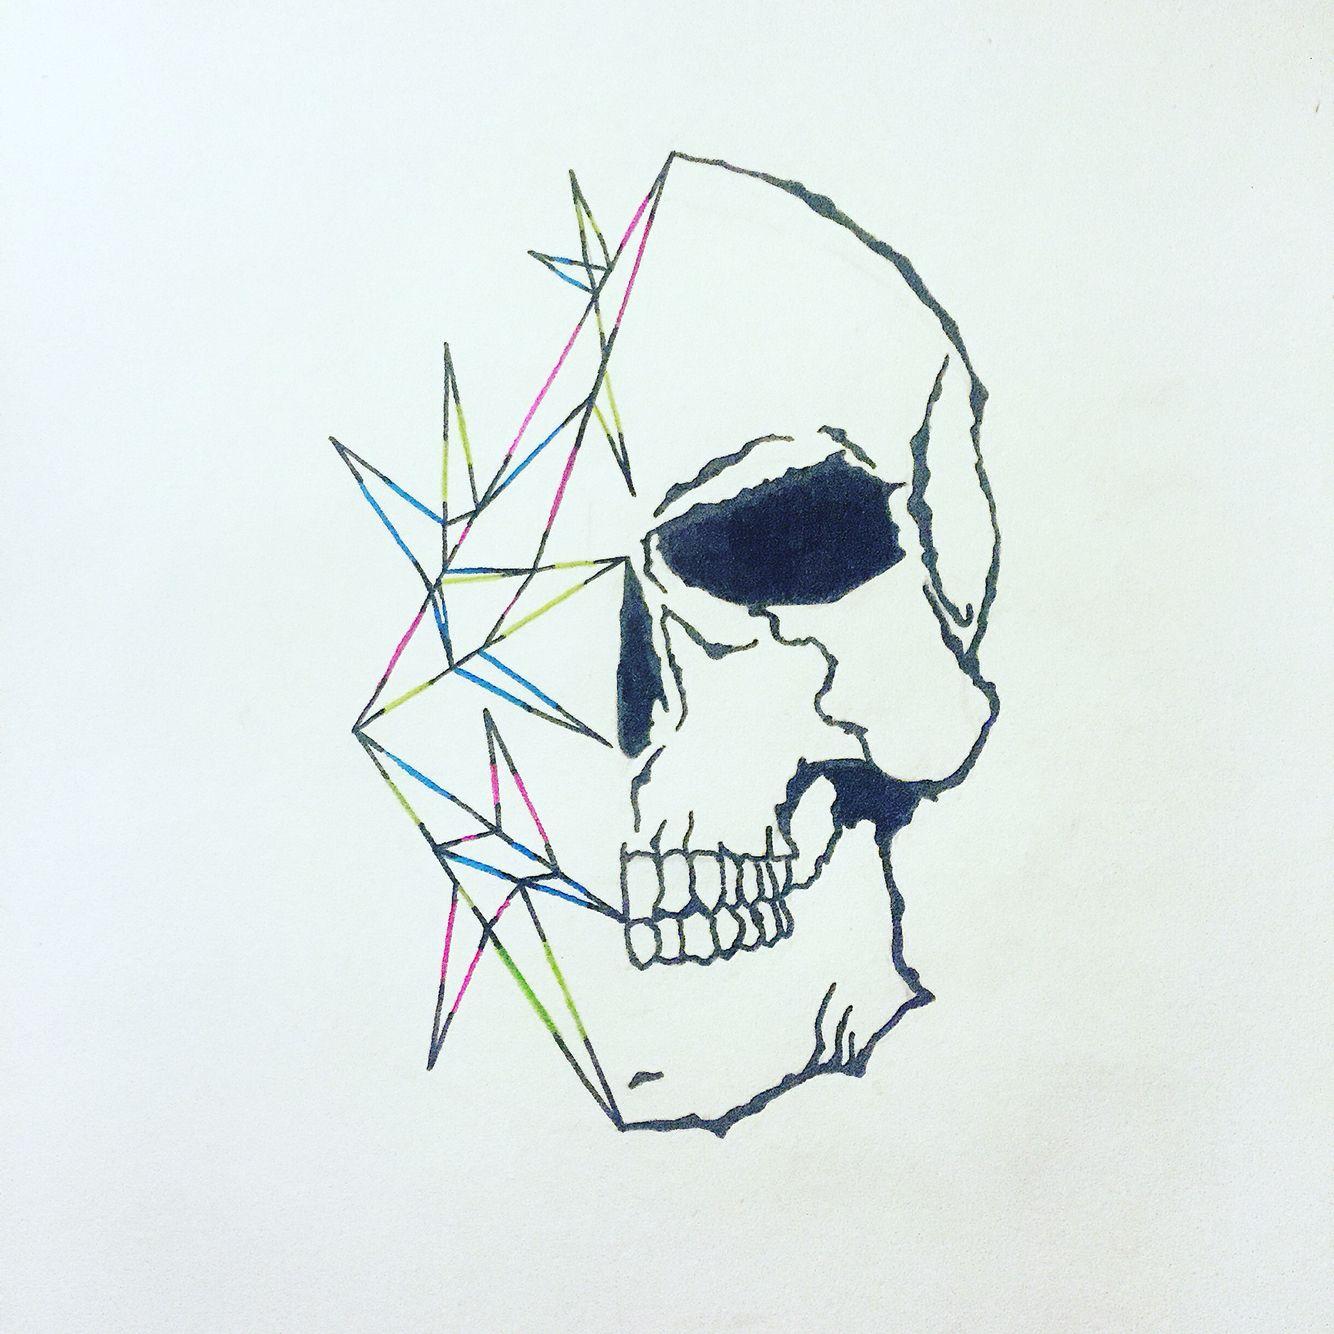 Crâne et géométrie